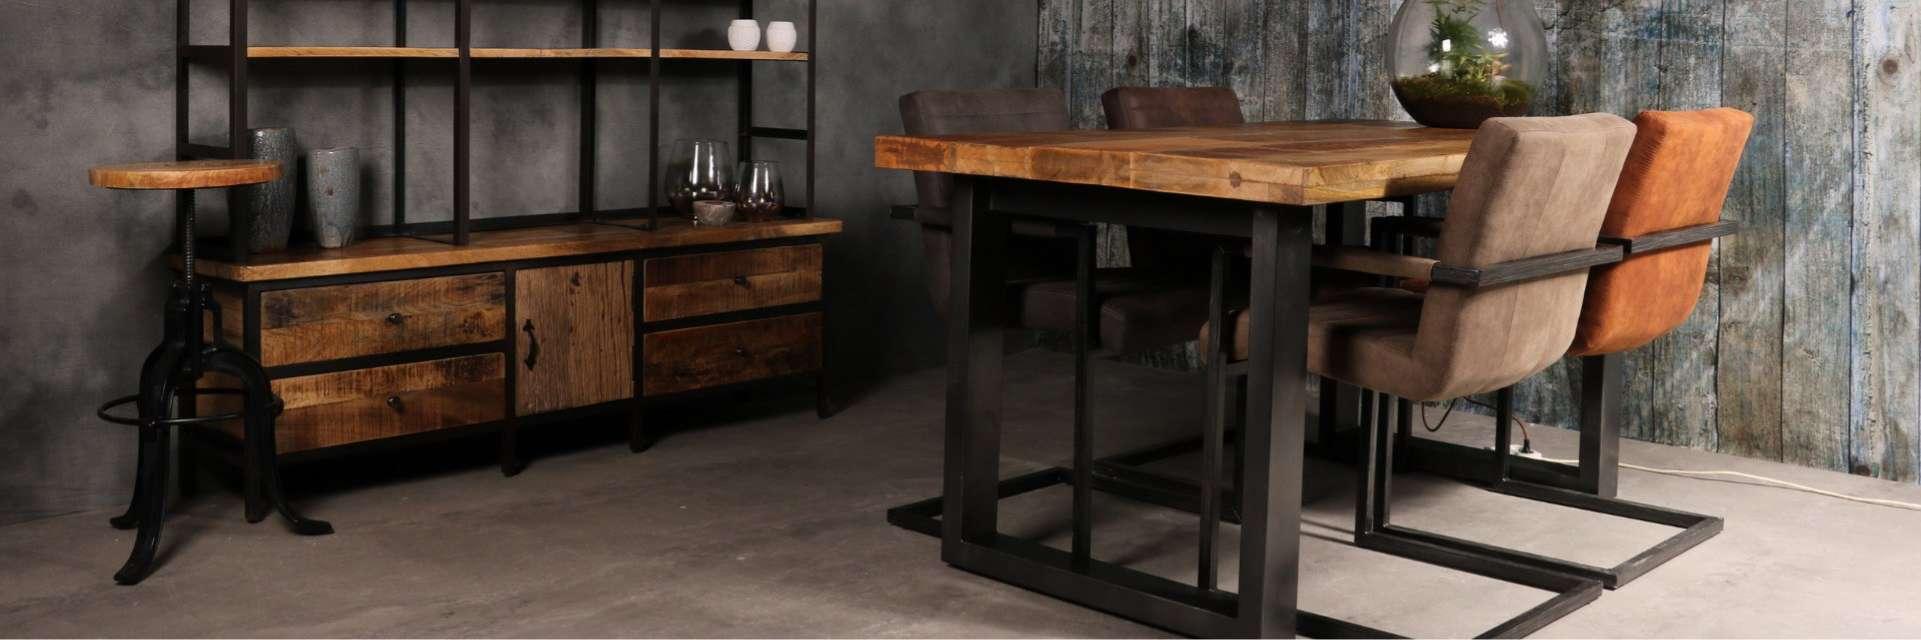 Bekijk alle mango houten meubels